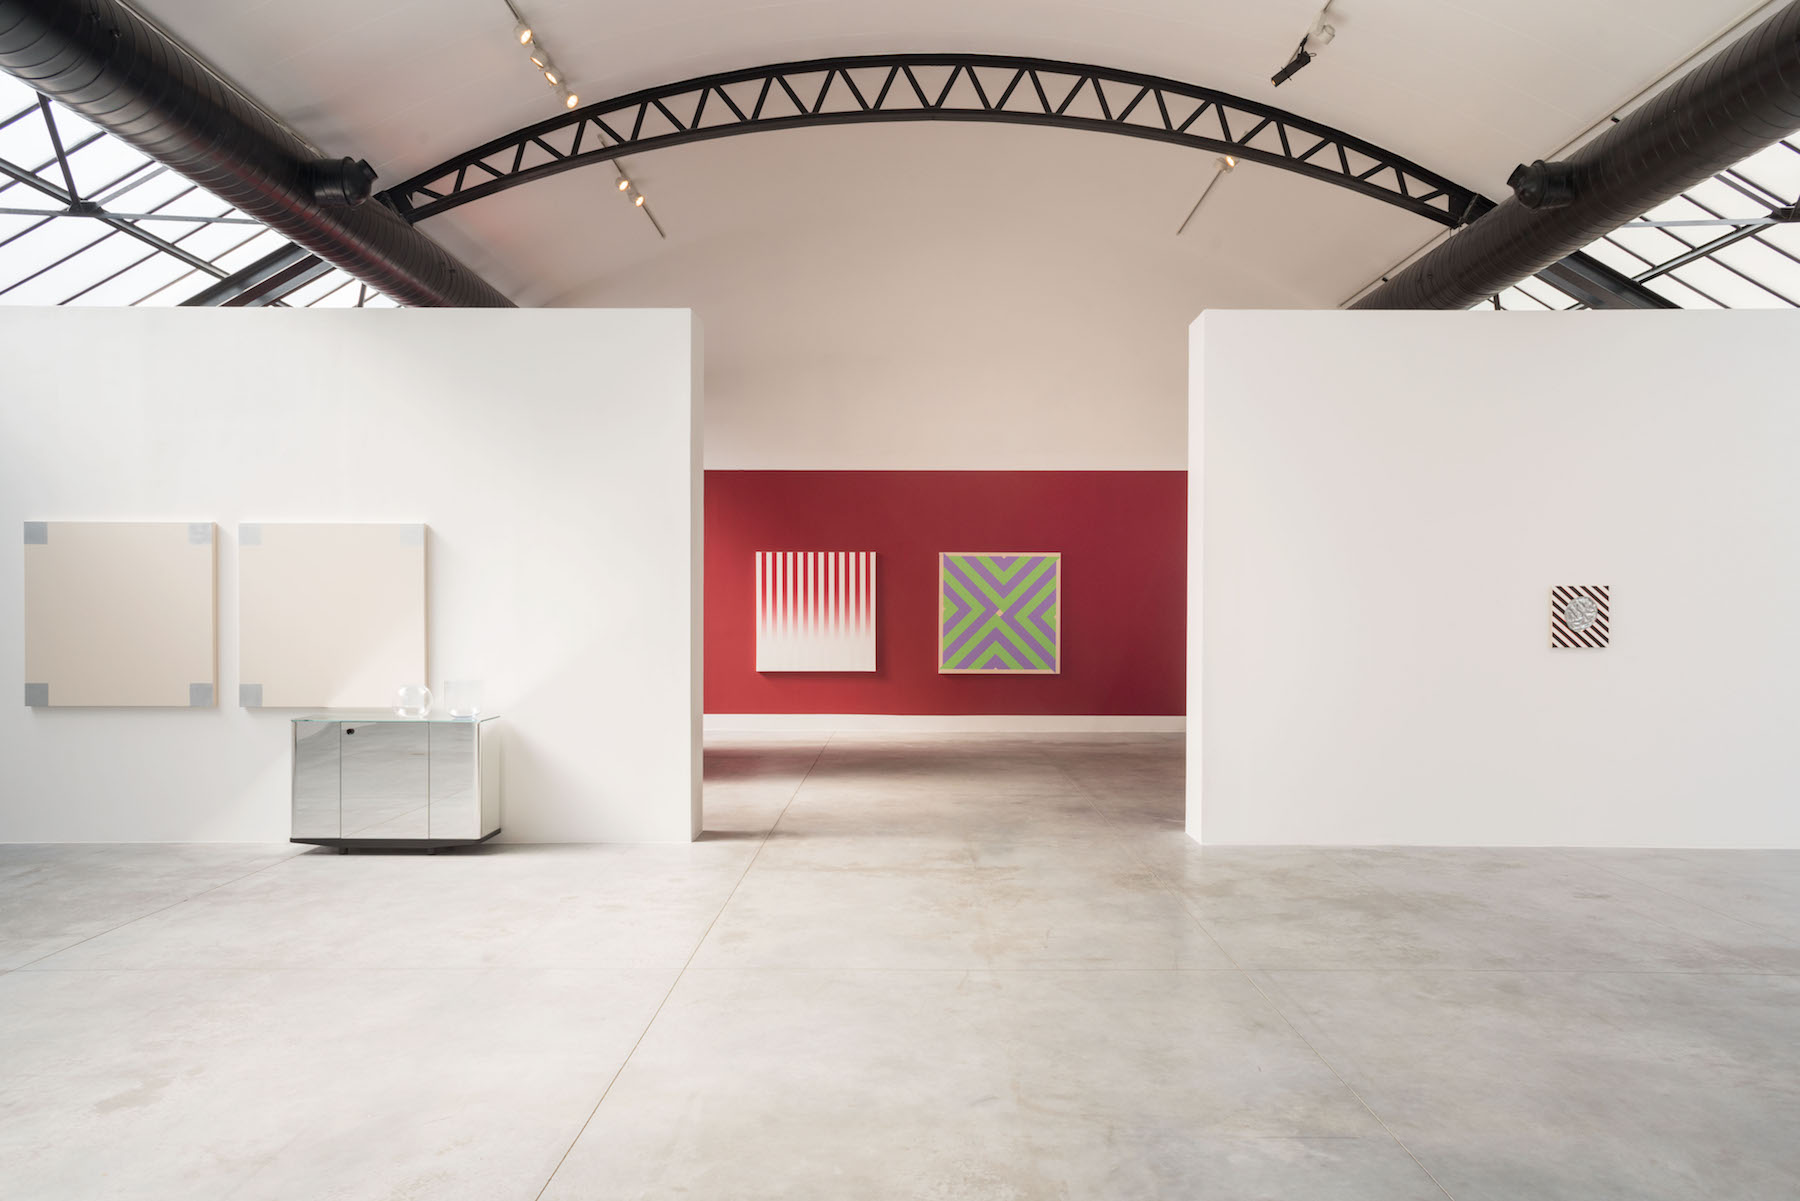 Exhibition view, Alentour, A project by John Armleder at Fondation CAB. Courtesy of Fondation CAB.